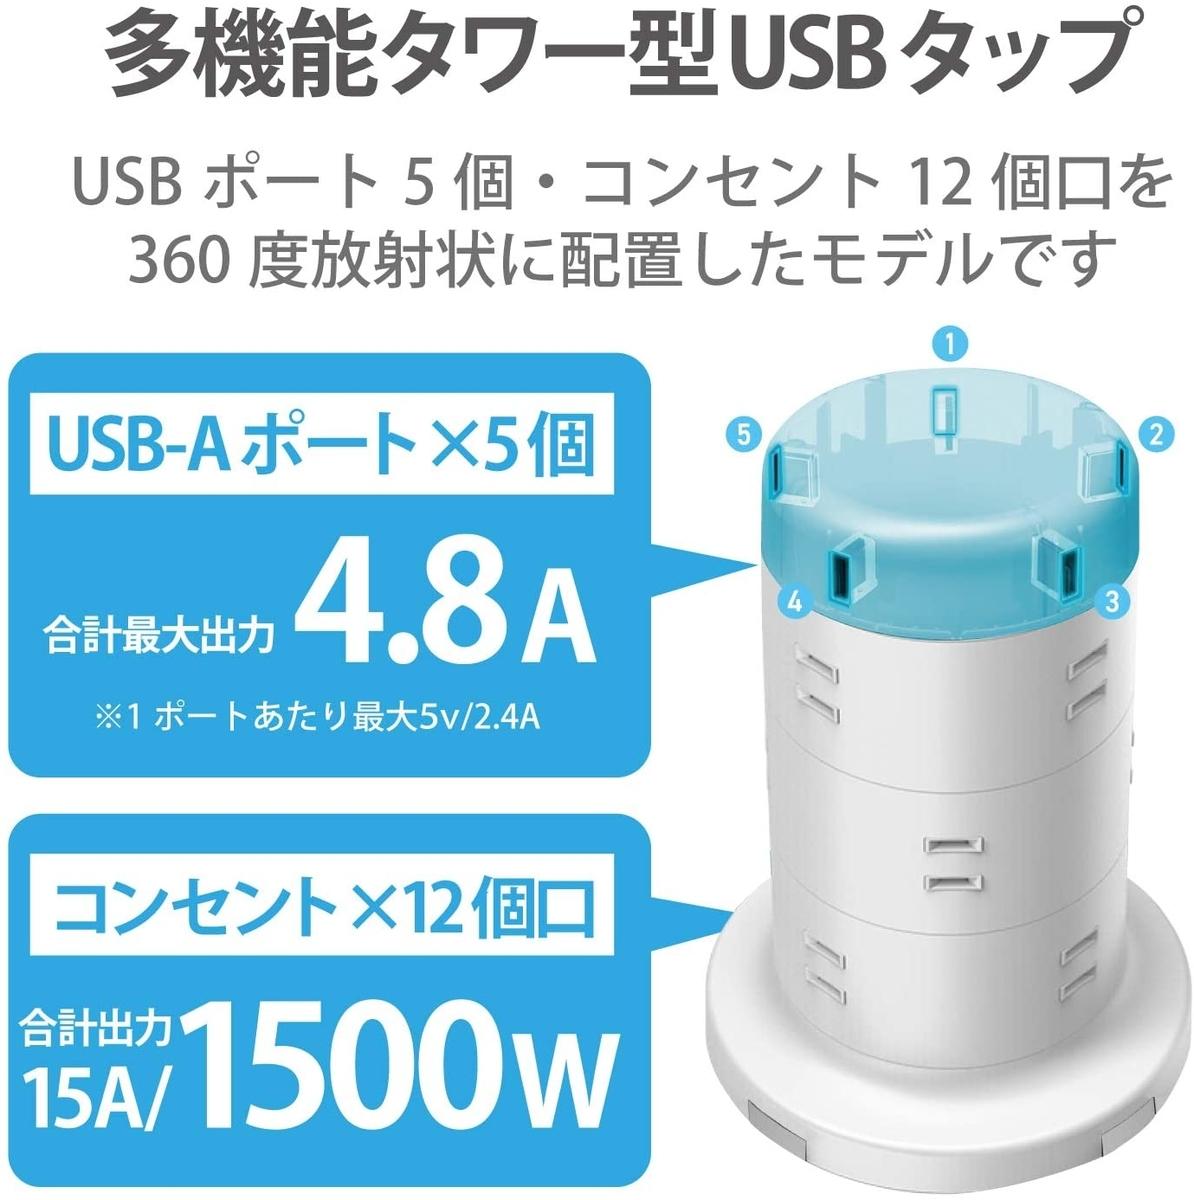 f:id:tsukasamochi:20201118022743j:plain